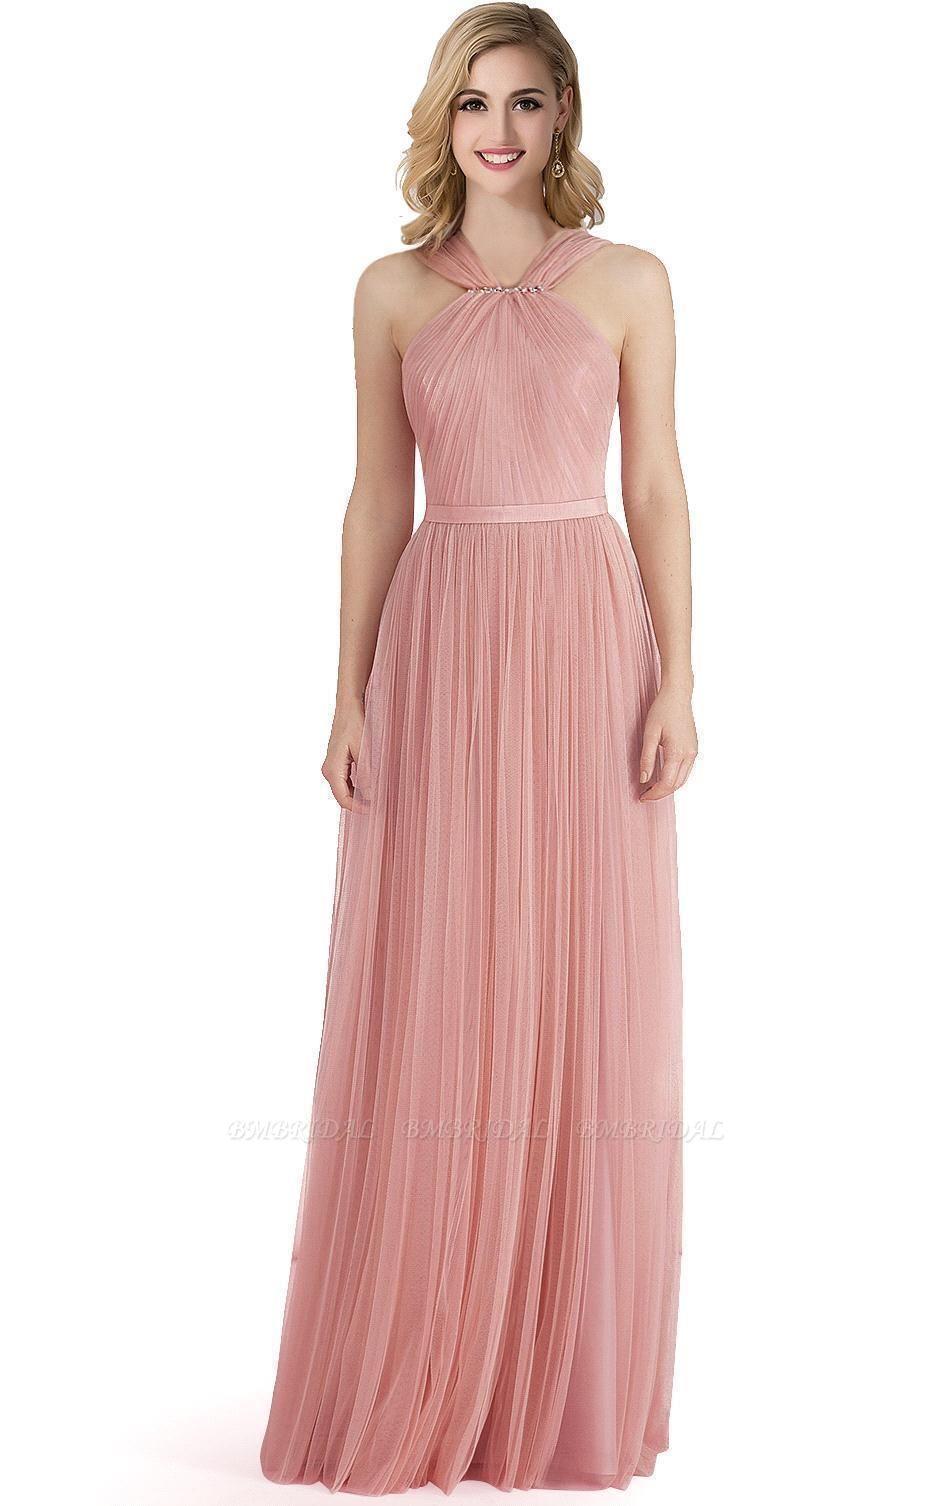 BMbridal Sheath Pink Tulle Ribbon Sash Simple Bridesmaid Dress